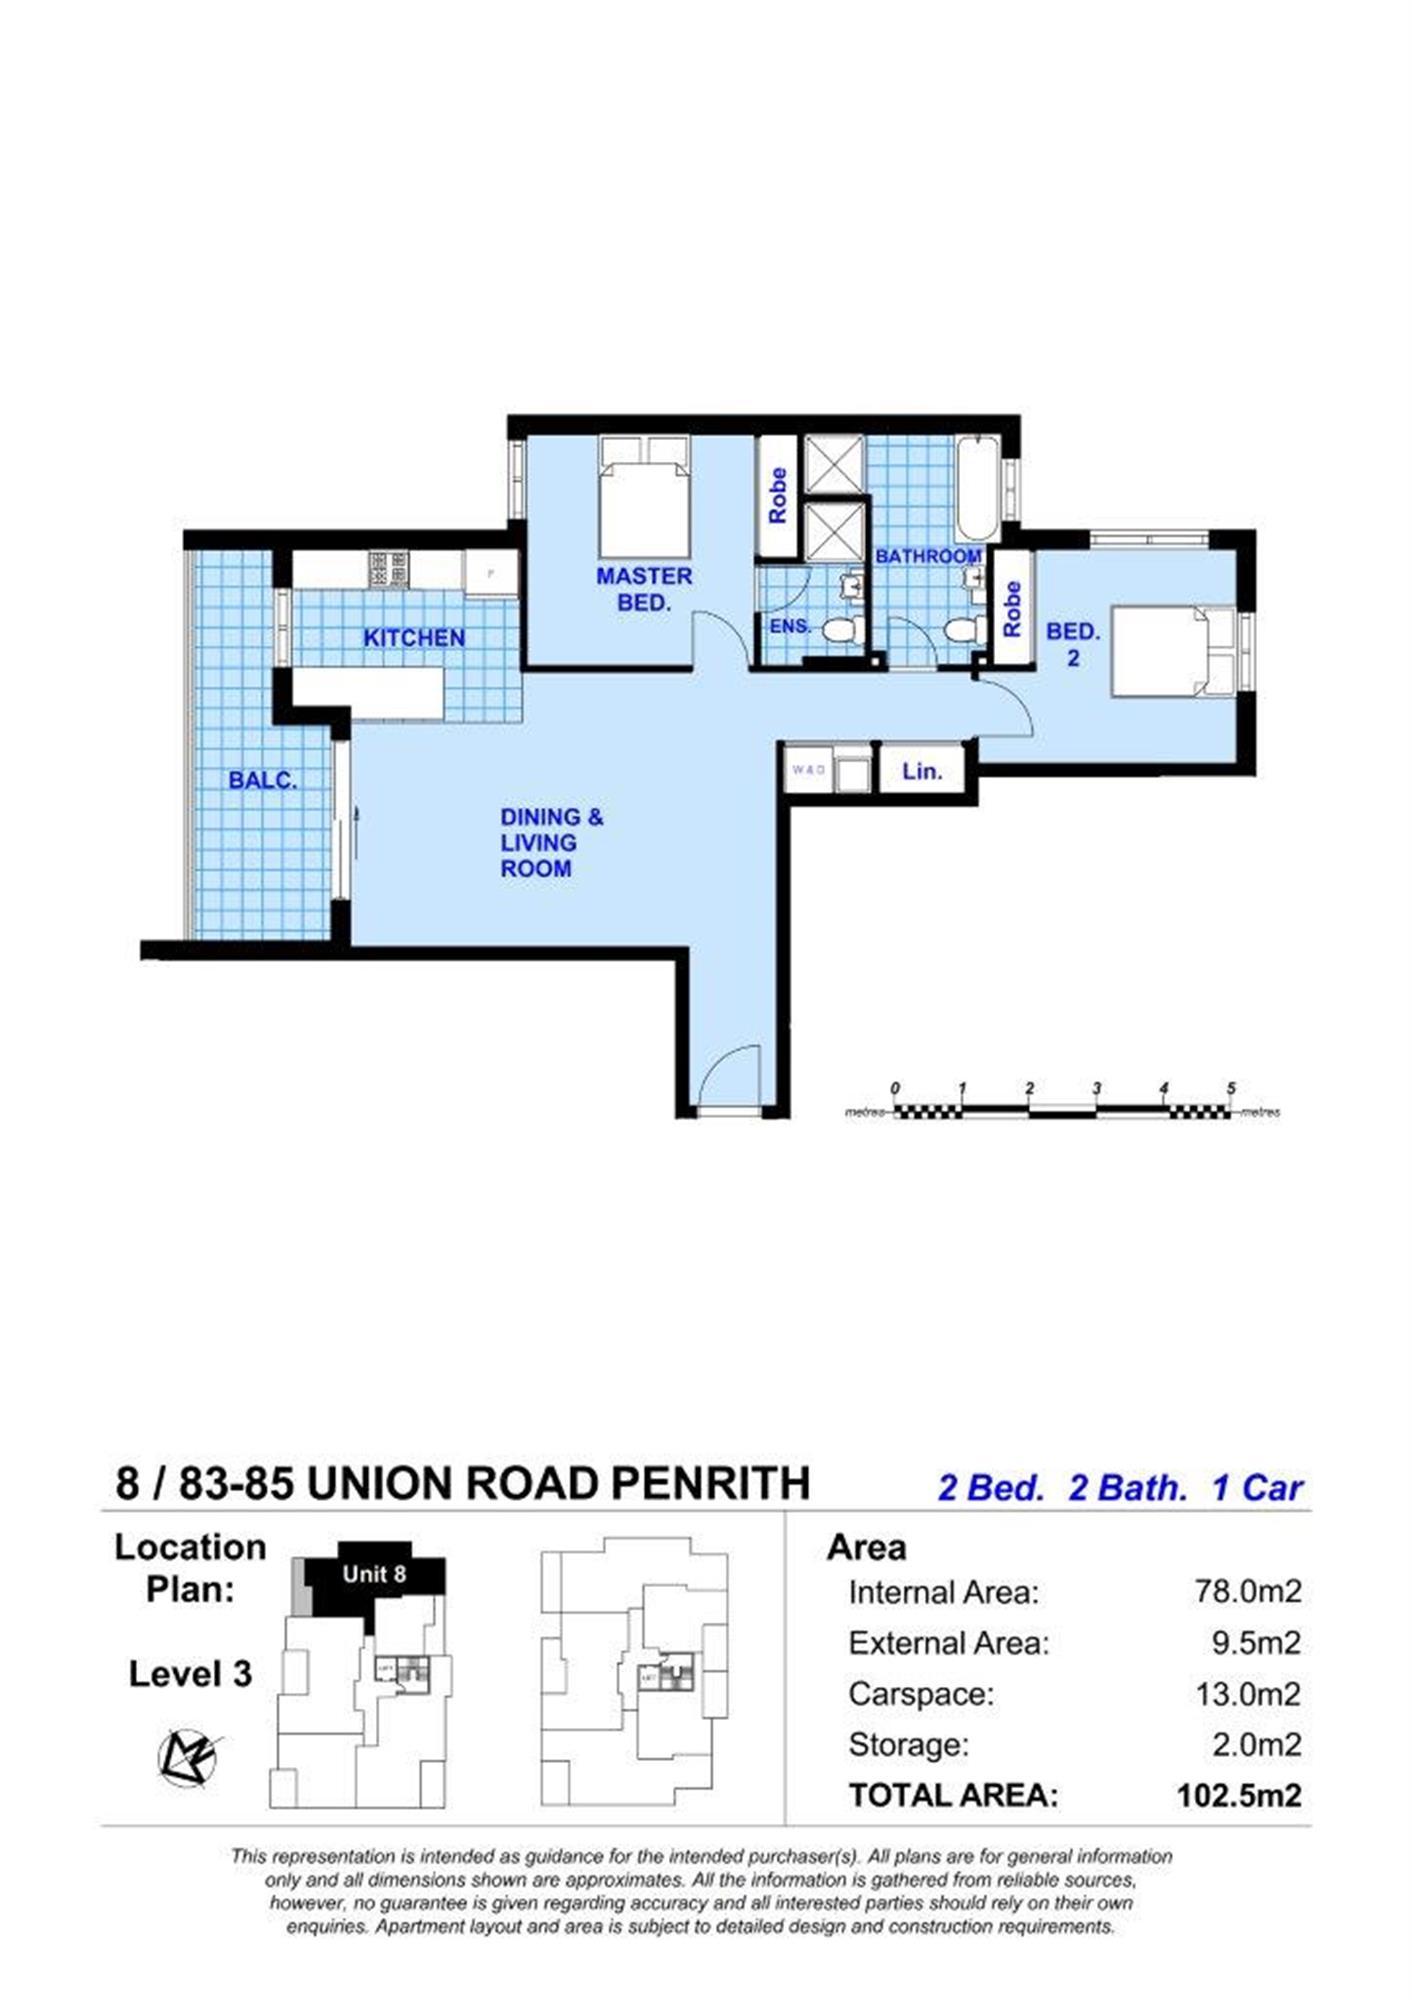 8/83-85 Union Road PENRITH, NSW 2750